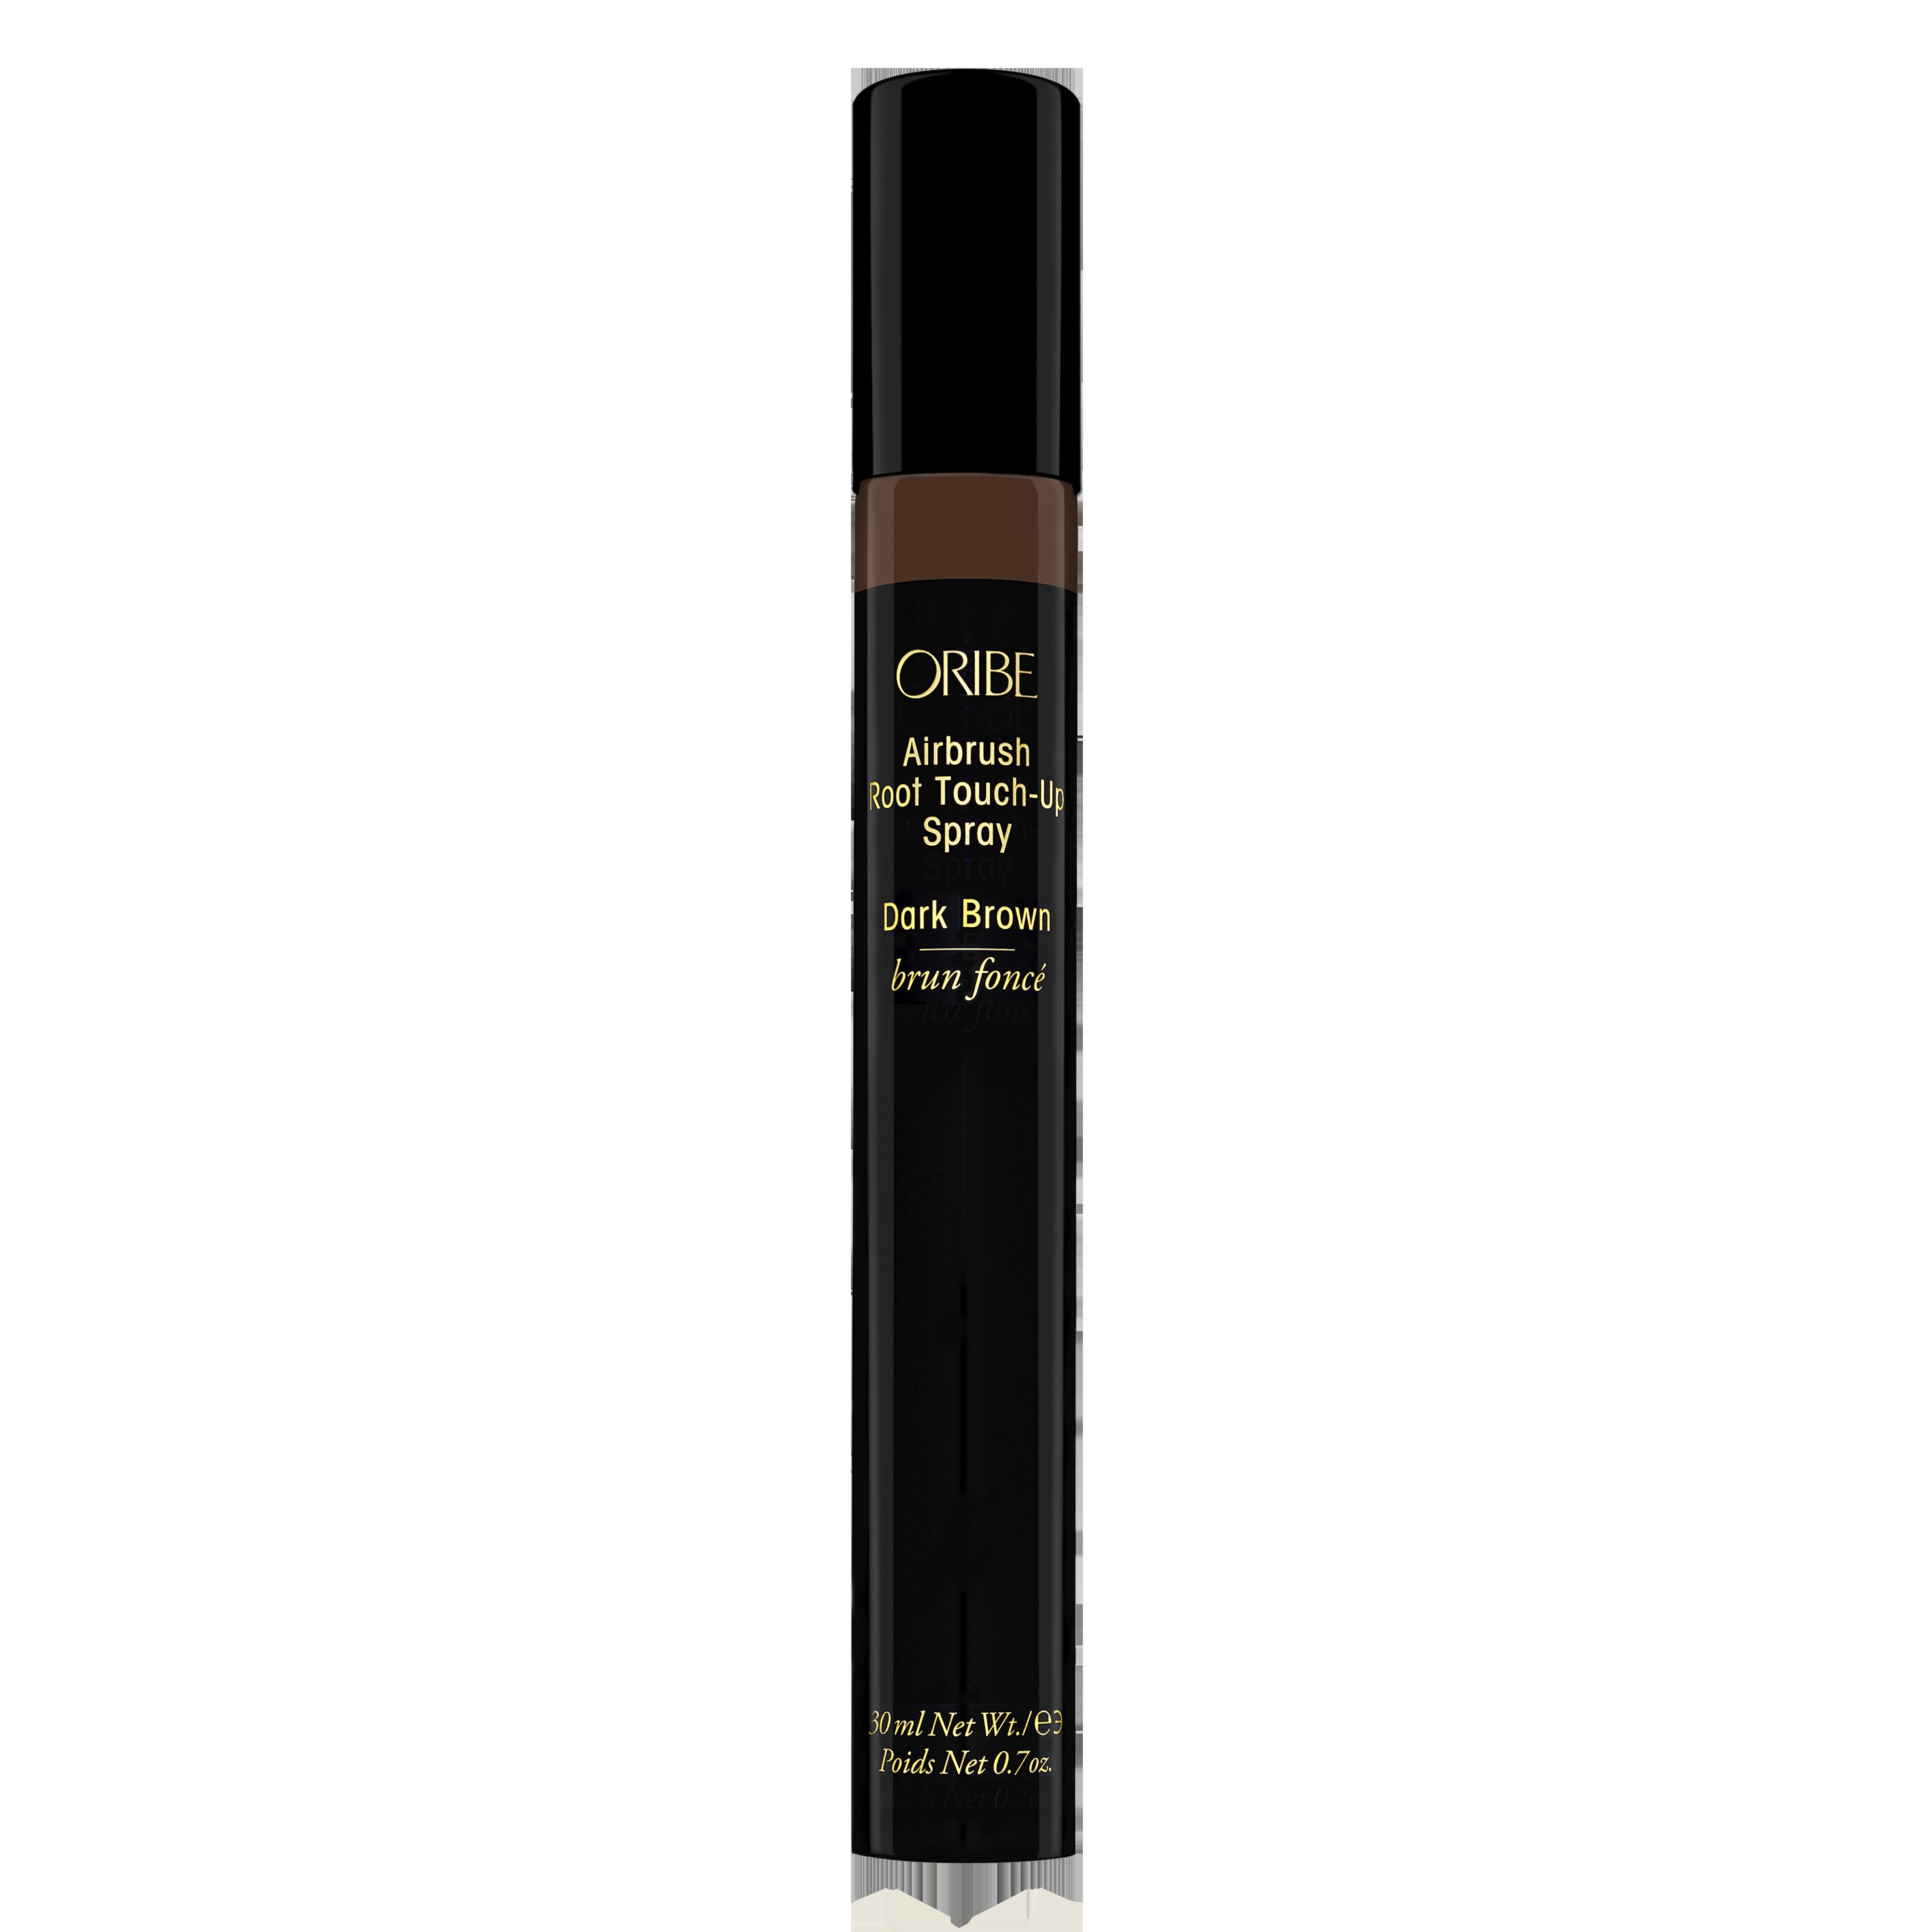 Airbrush Root Touch Up Spray Dark Brown